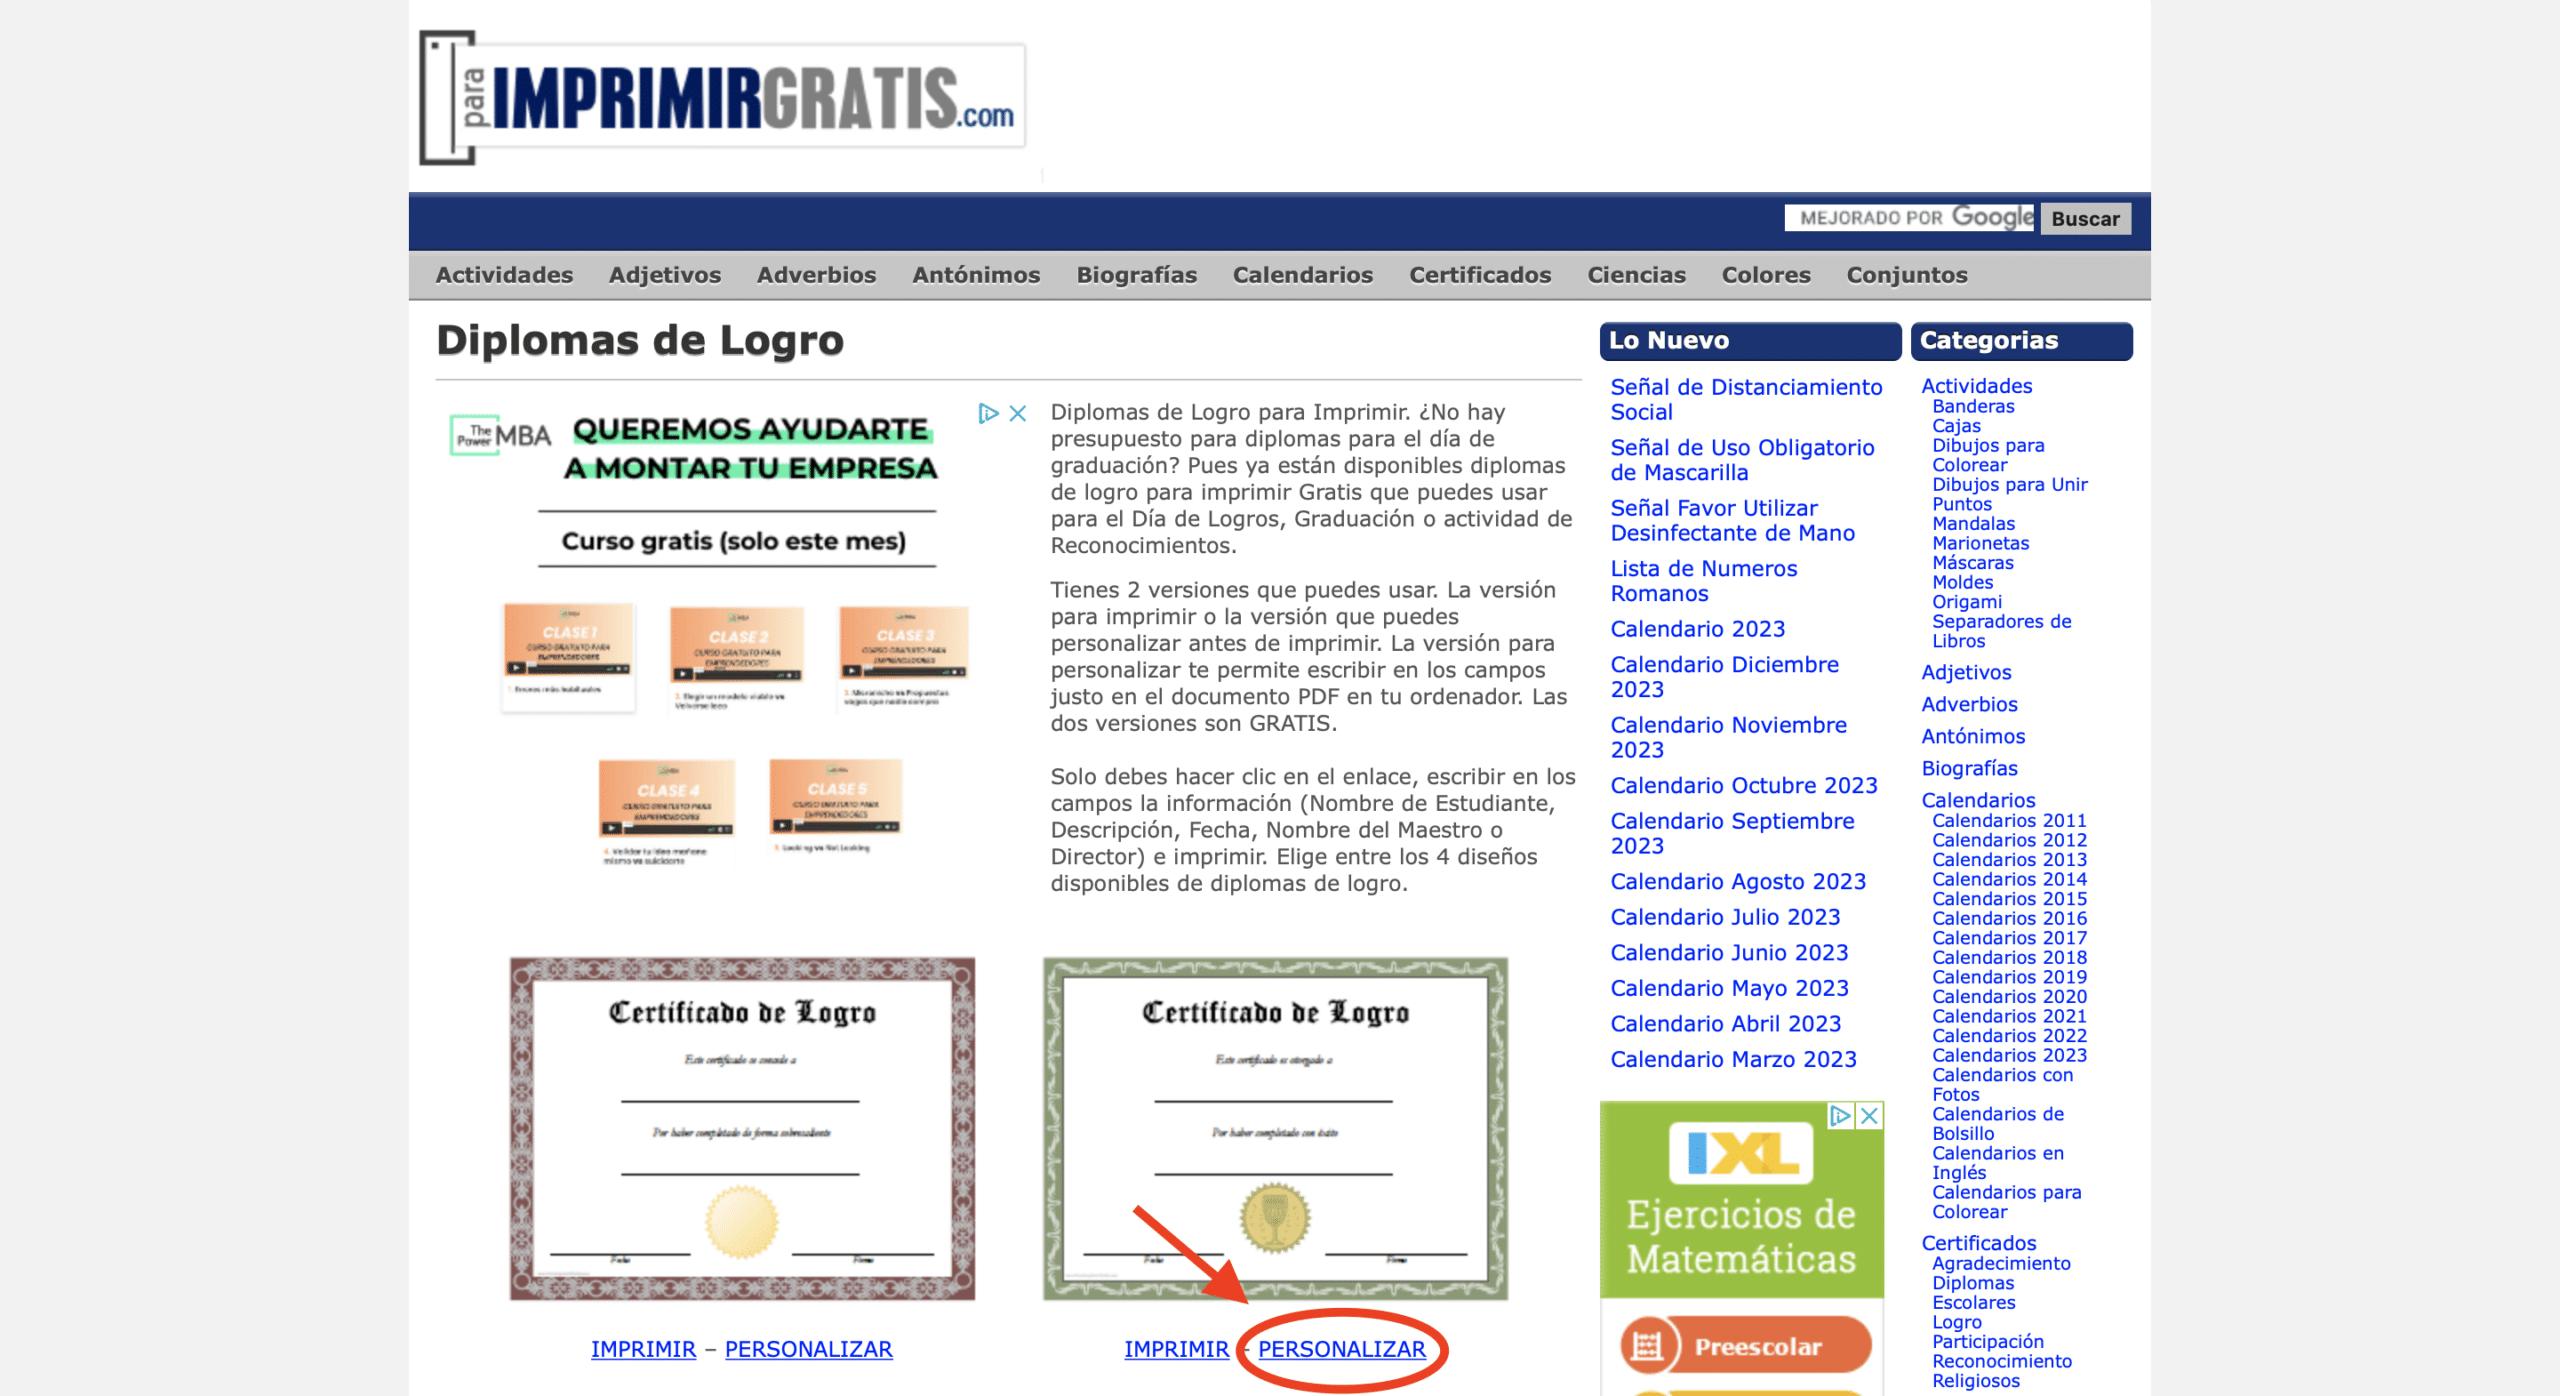 Diplomas virtuales para imprimir